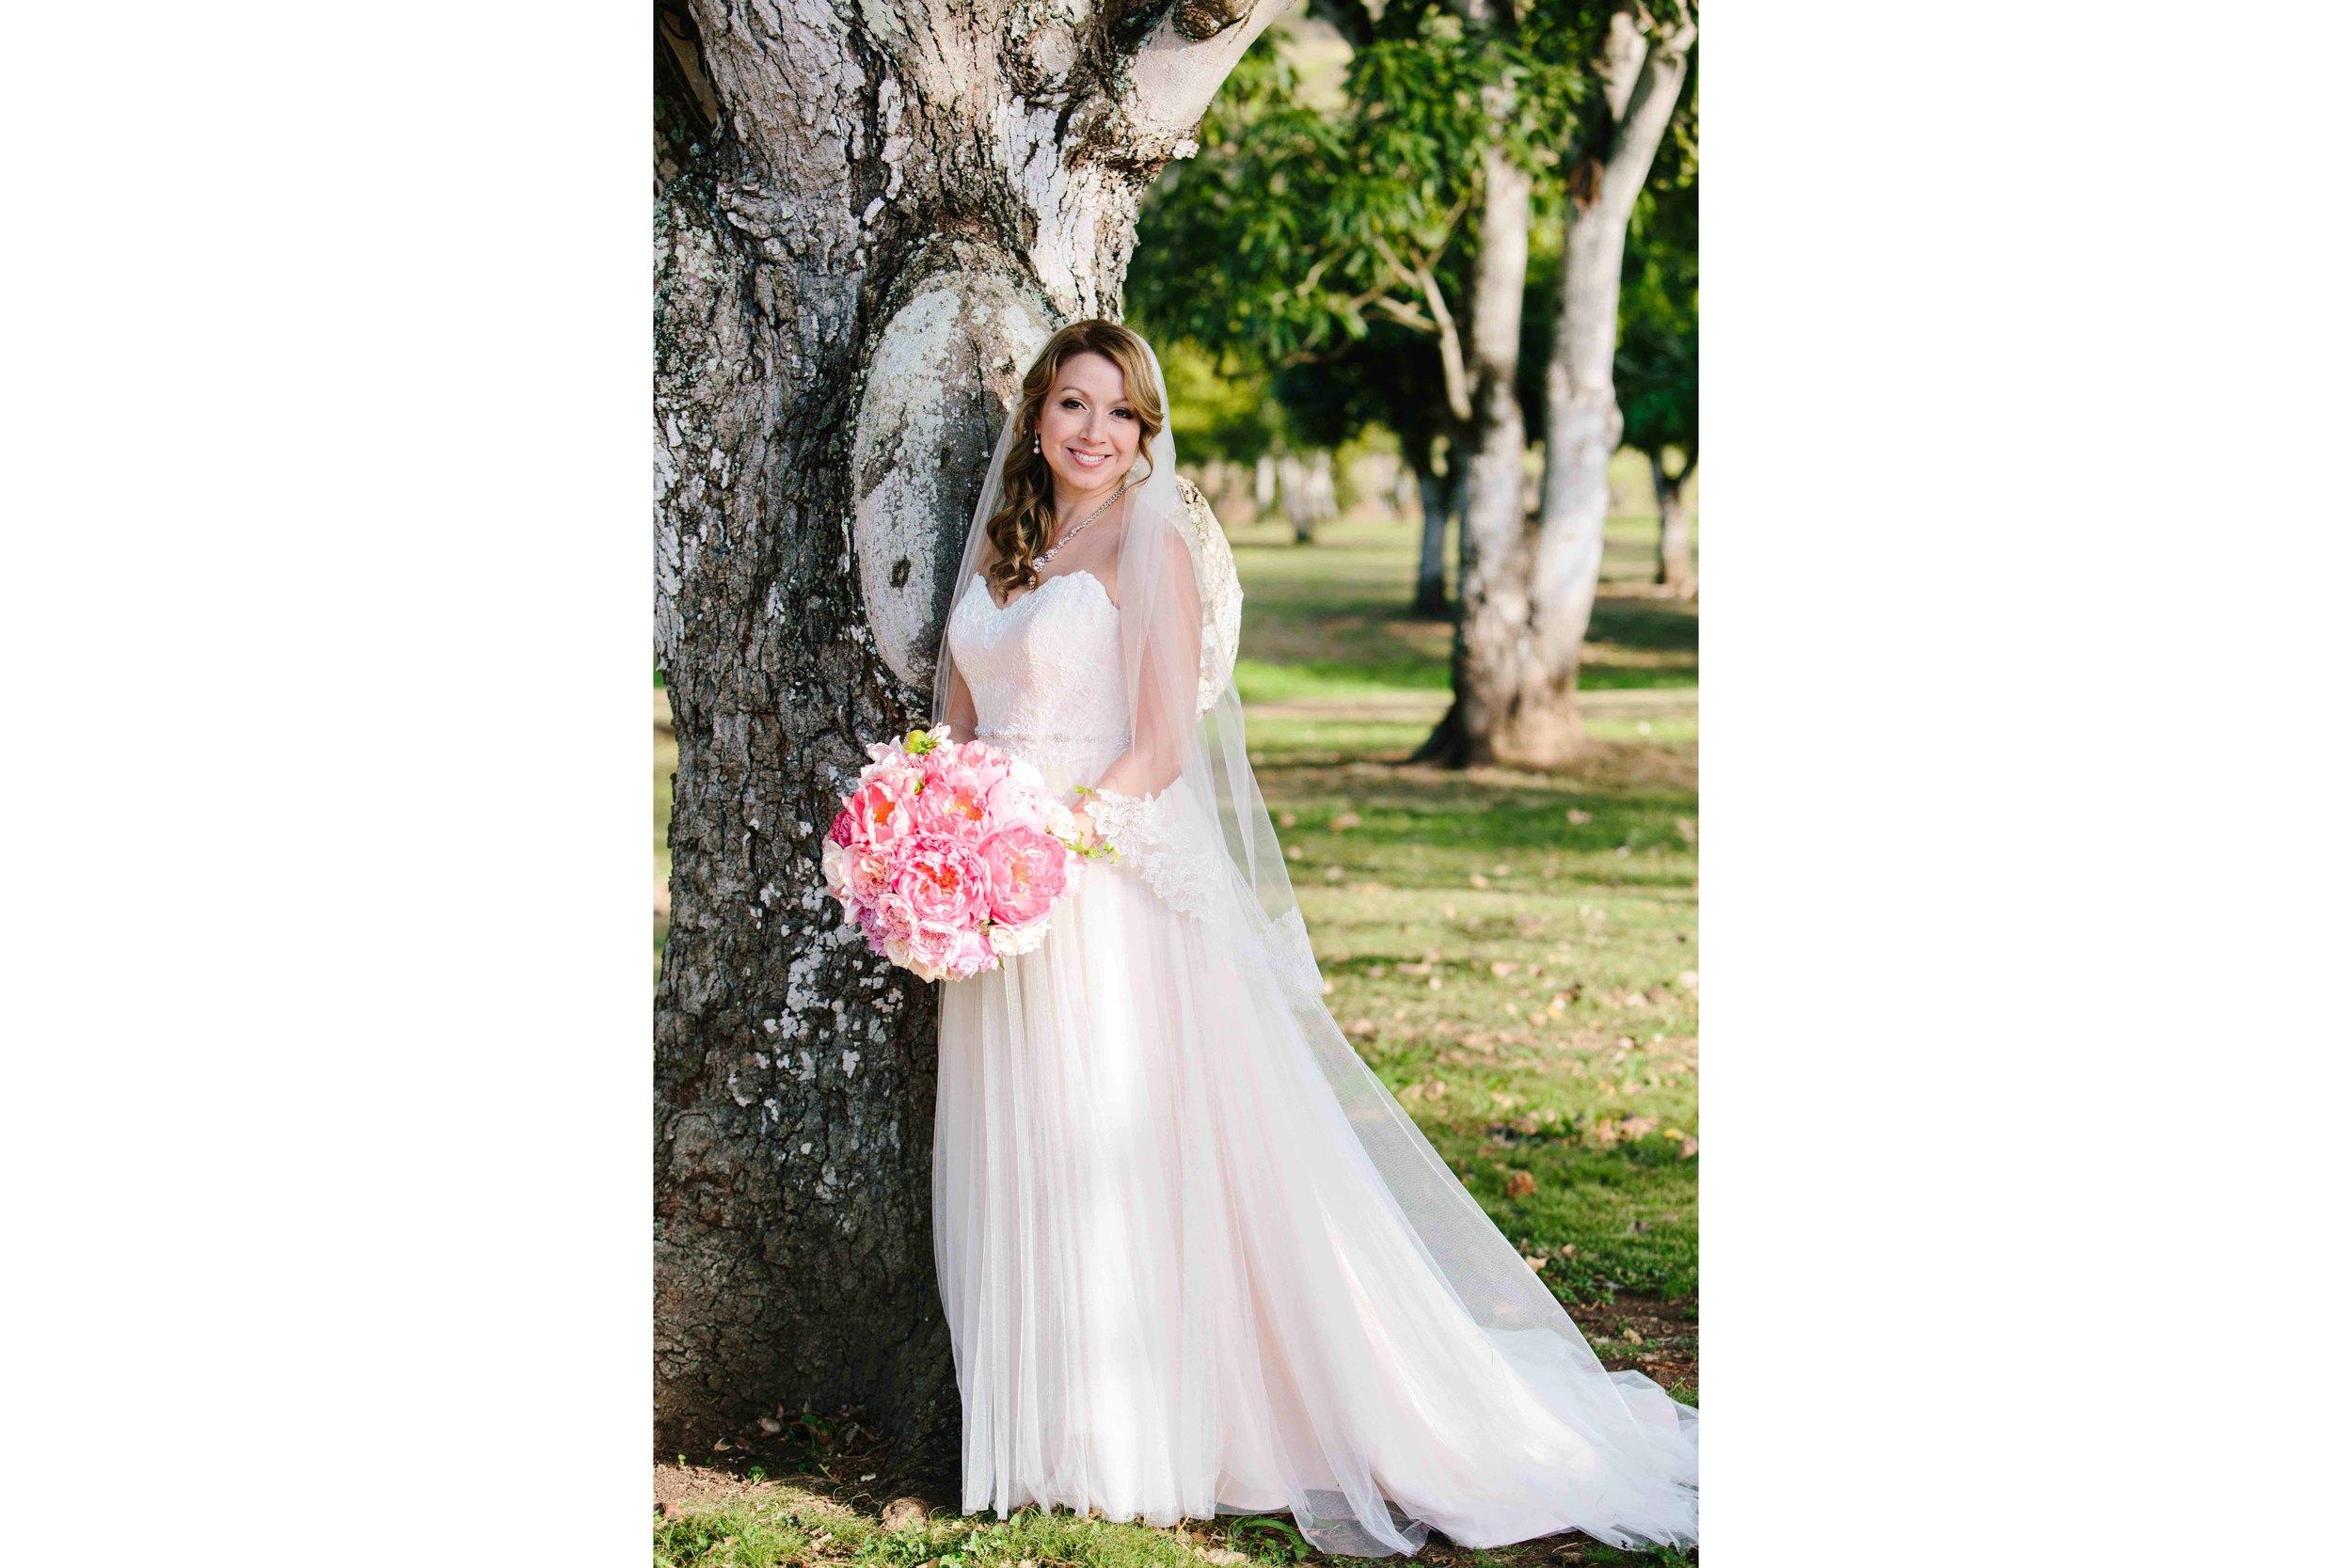 Bride at Dillingham Ranch